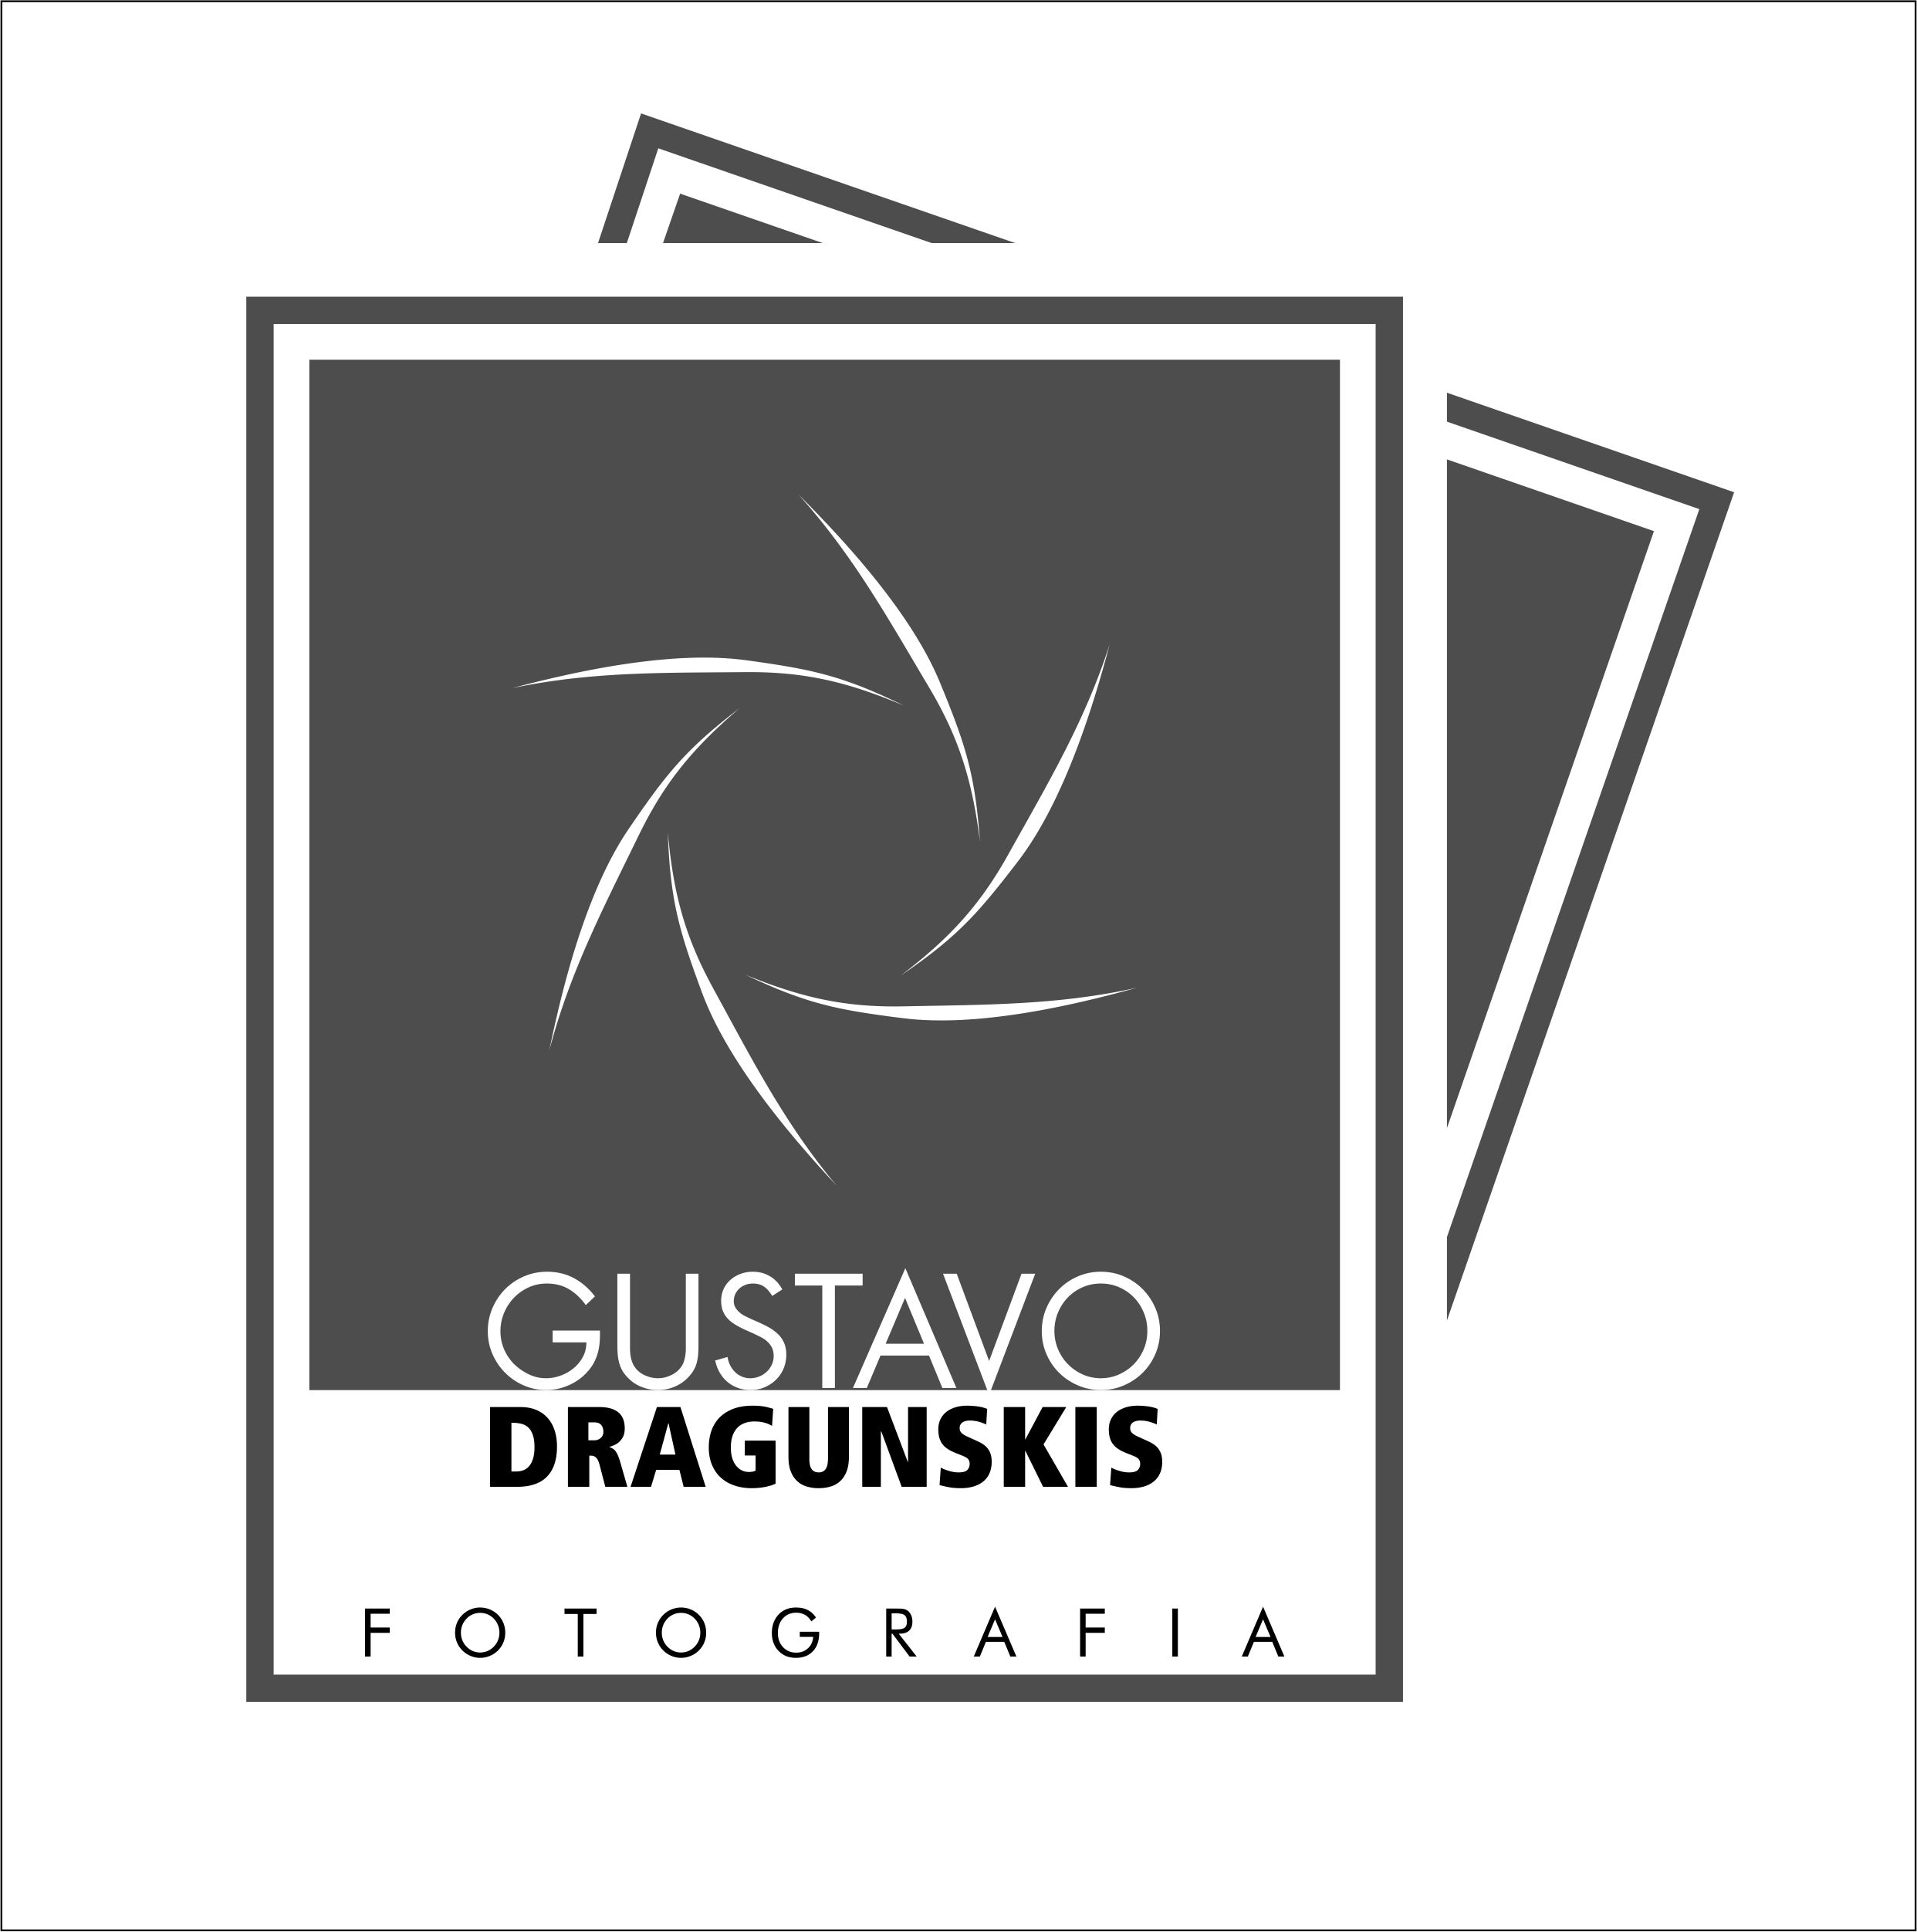 Gustavo Dragunskis